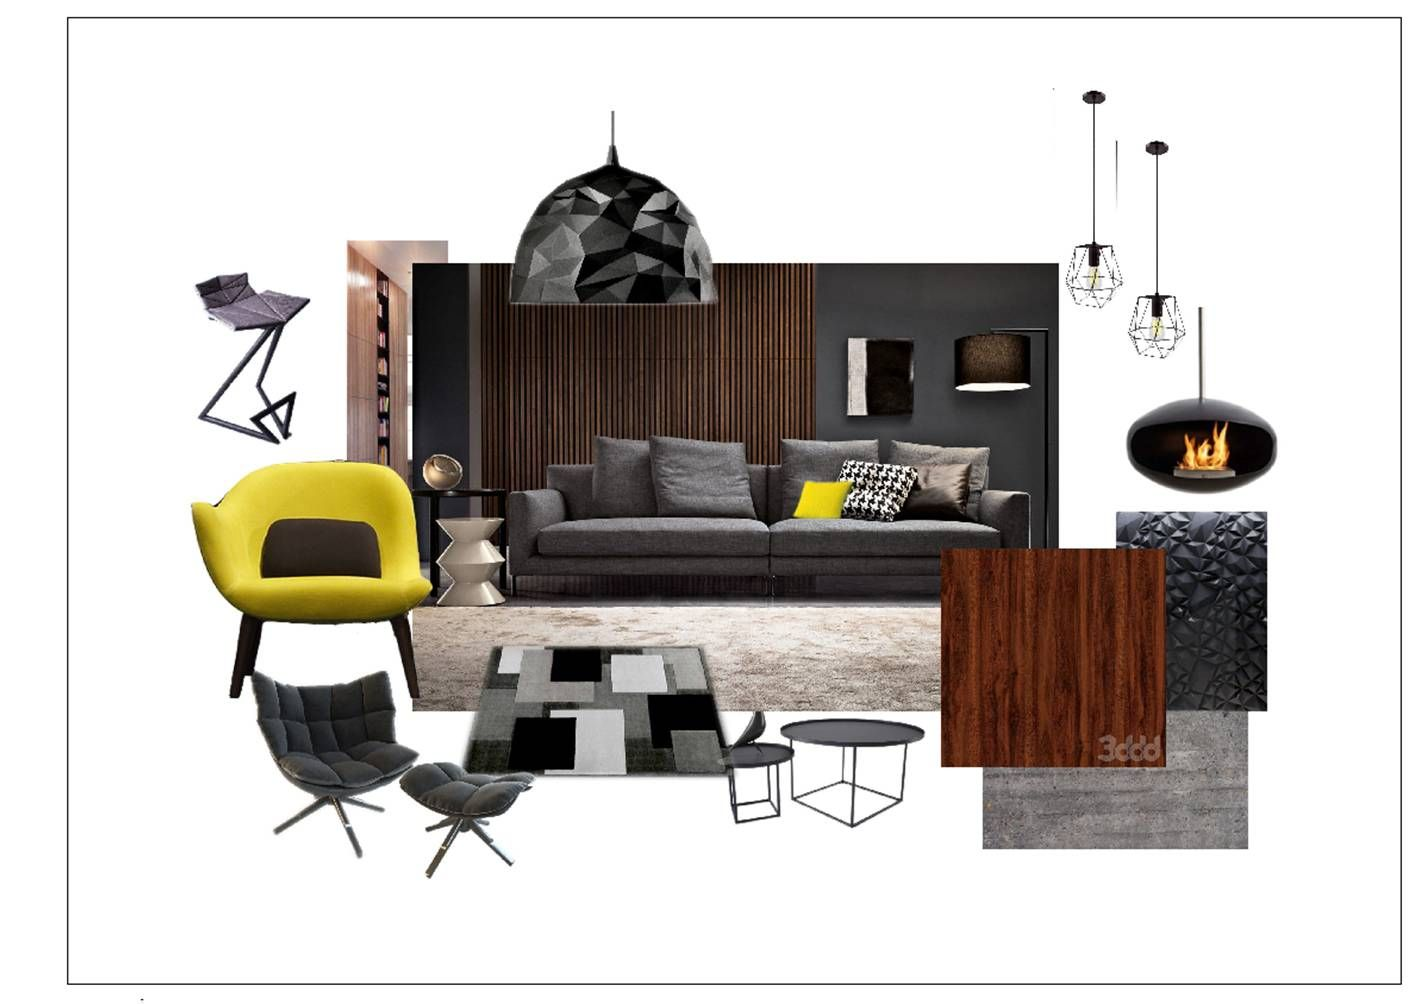 Contemporary Style Livingroom Collage By Victoria Seminozhenko Interior Design Course Student In European